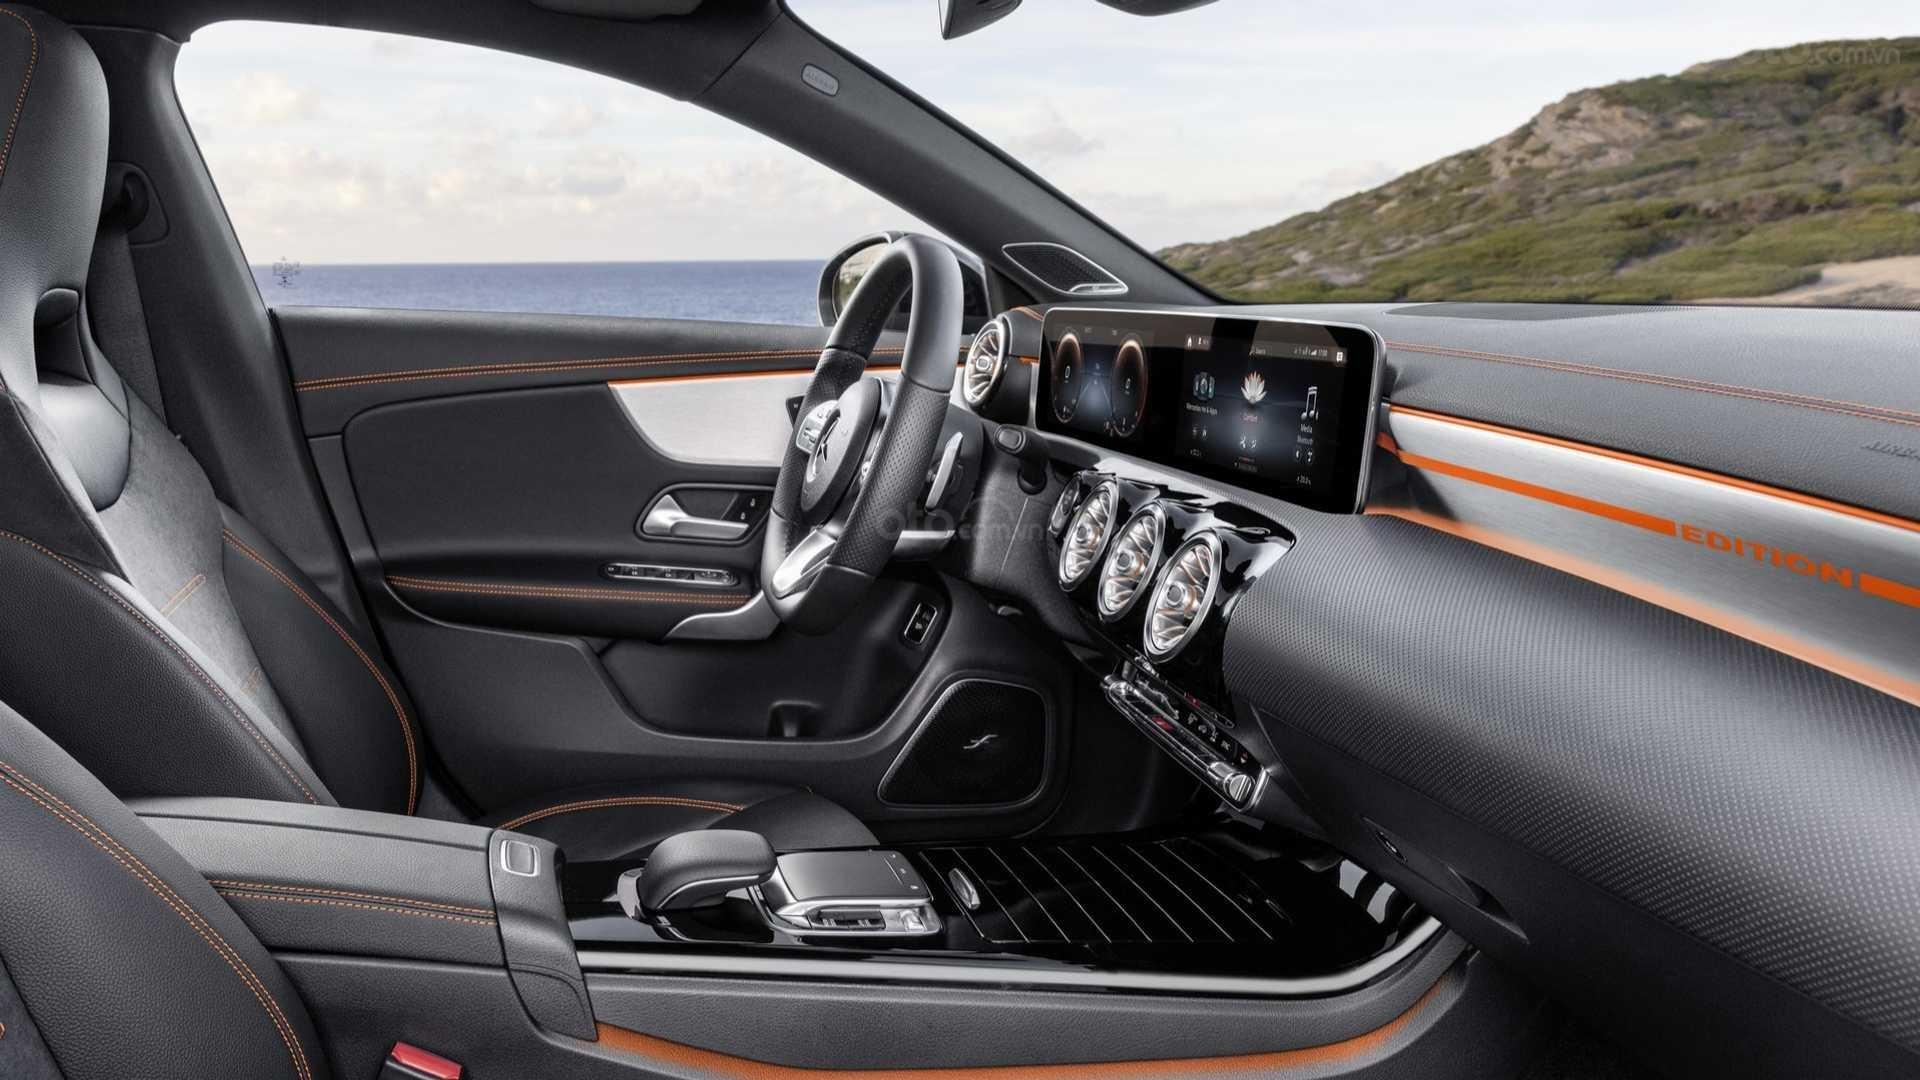 Mercedes-Benz GLA-Class 2020 - bảng táp-lô